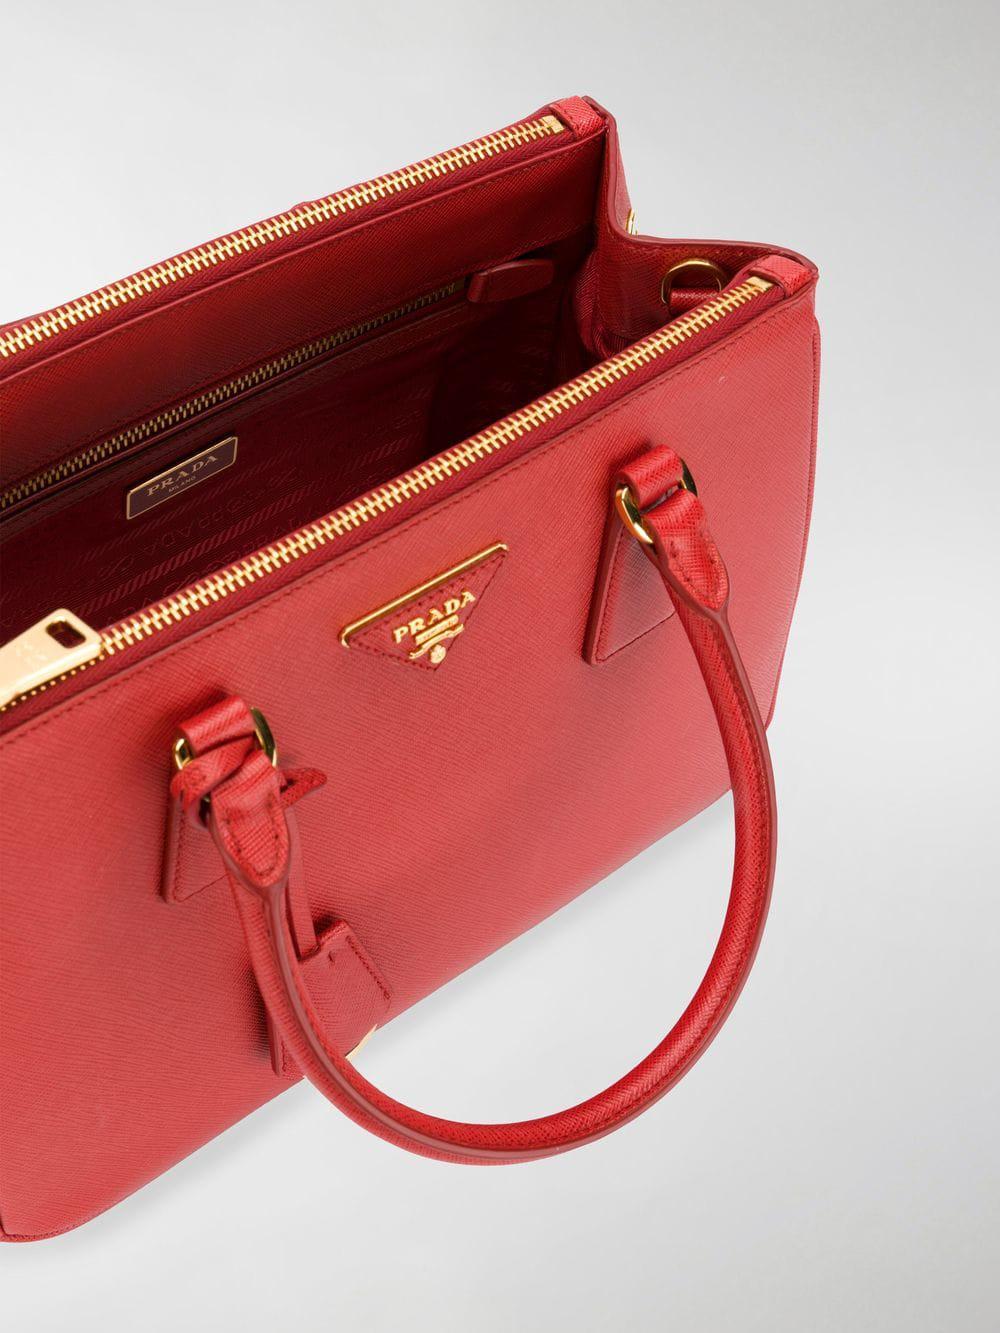 Prada Leather Mini Galleria Tote in Red